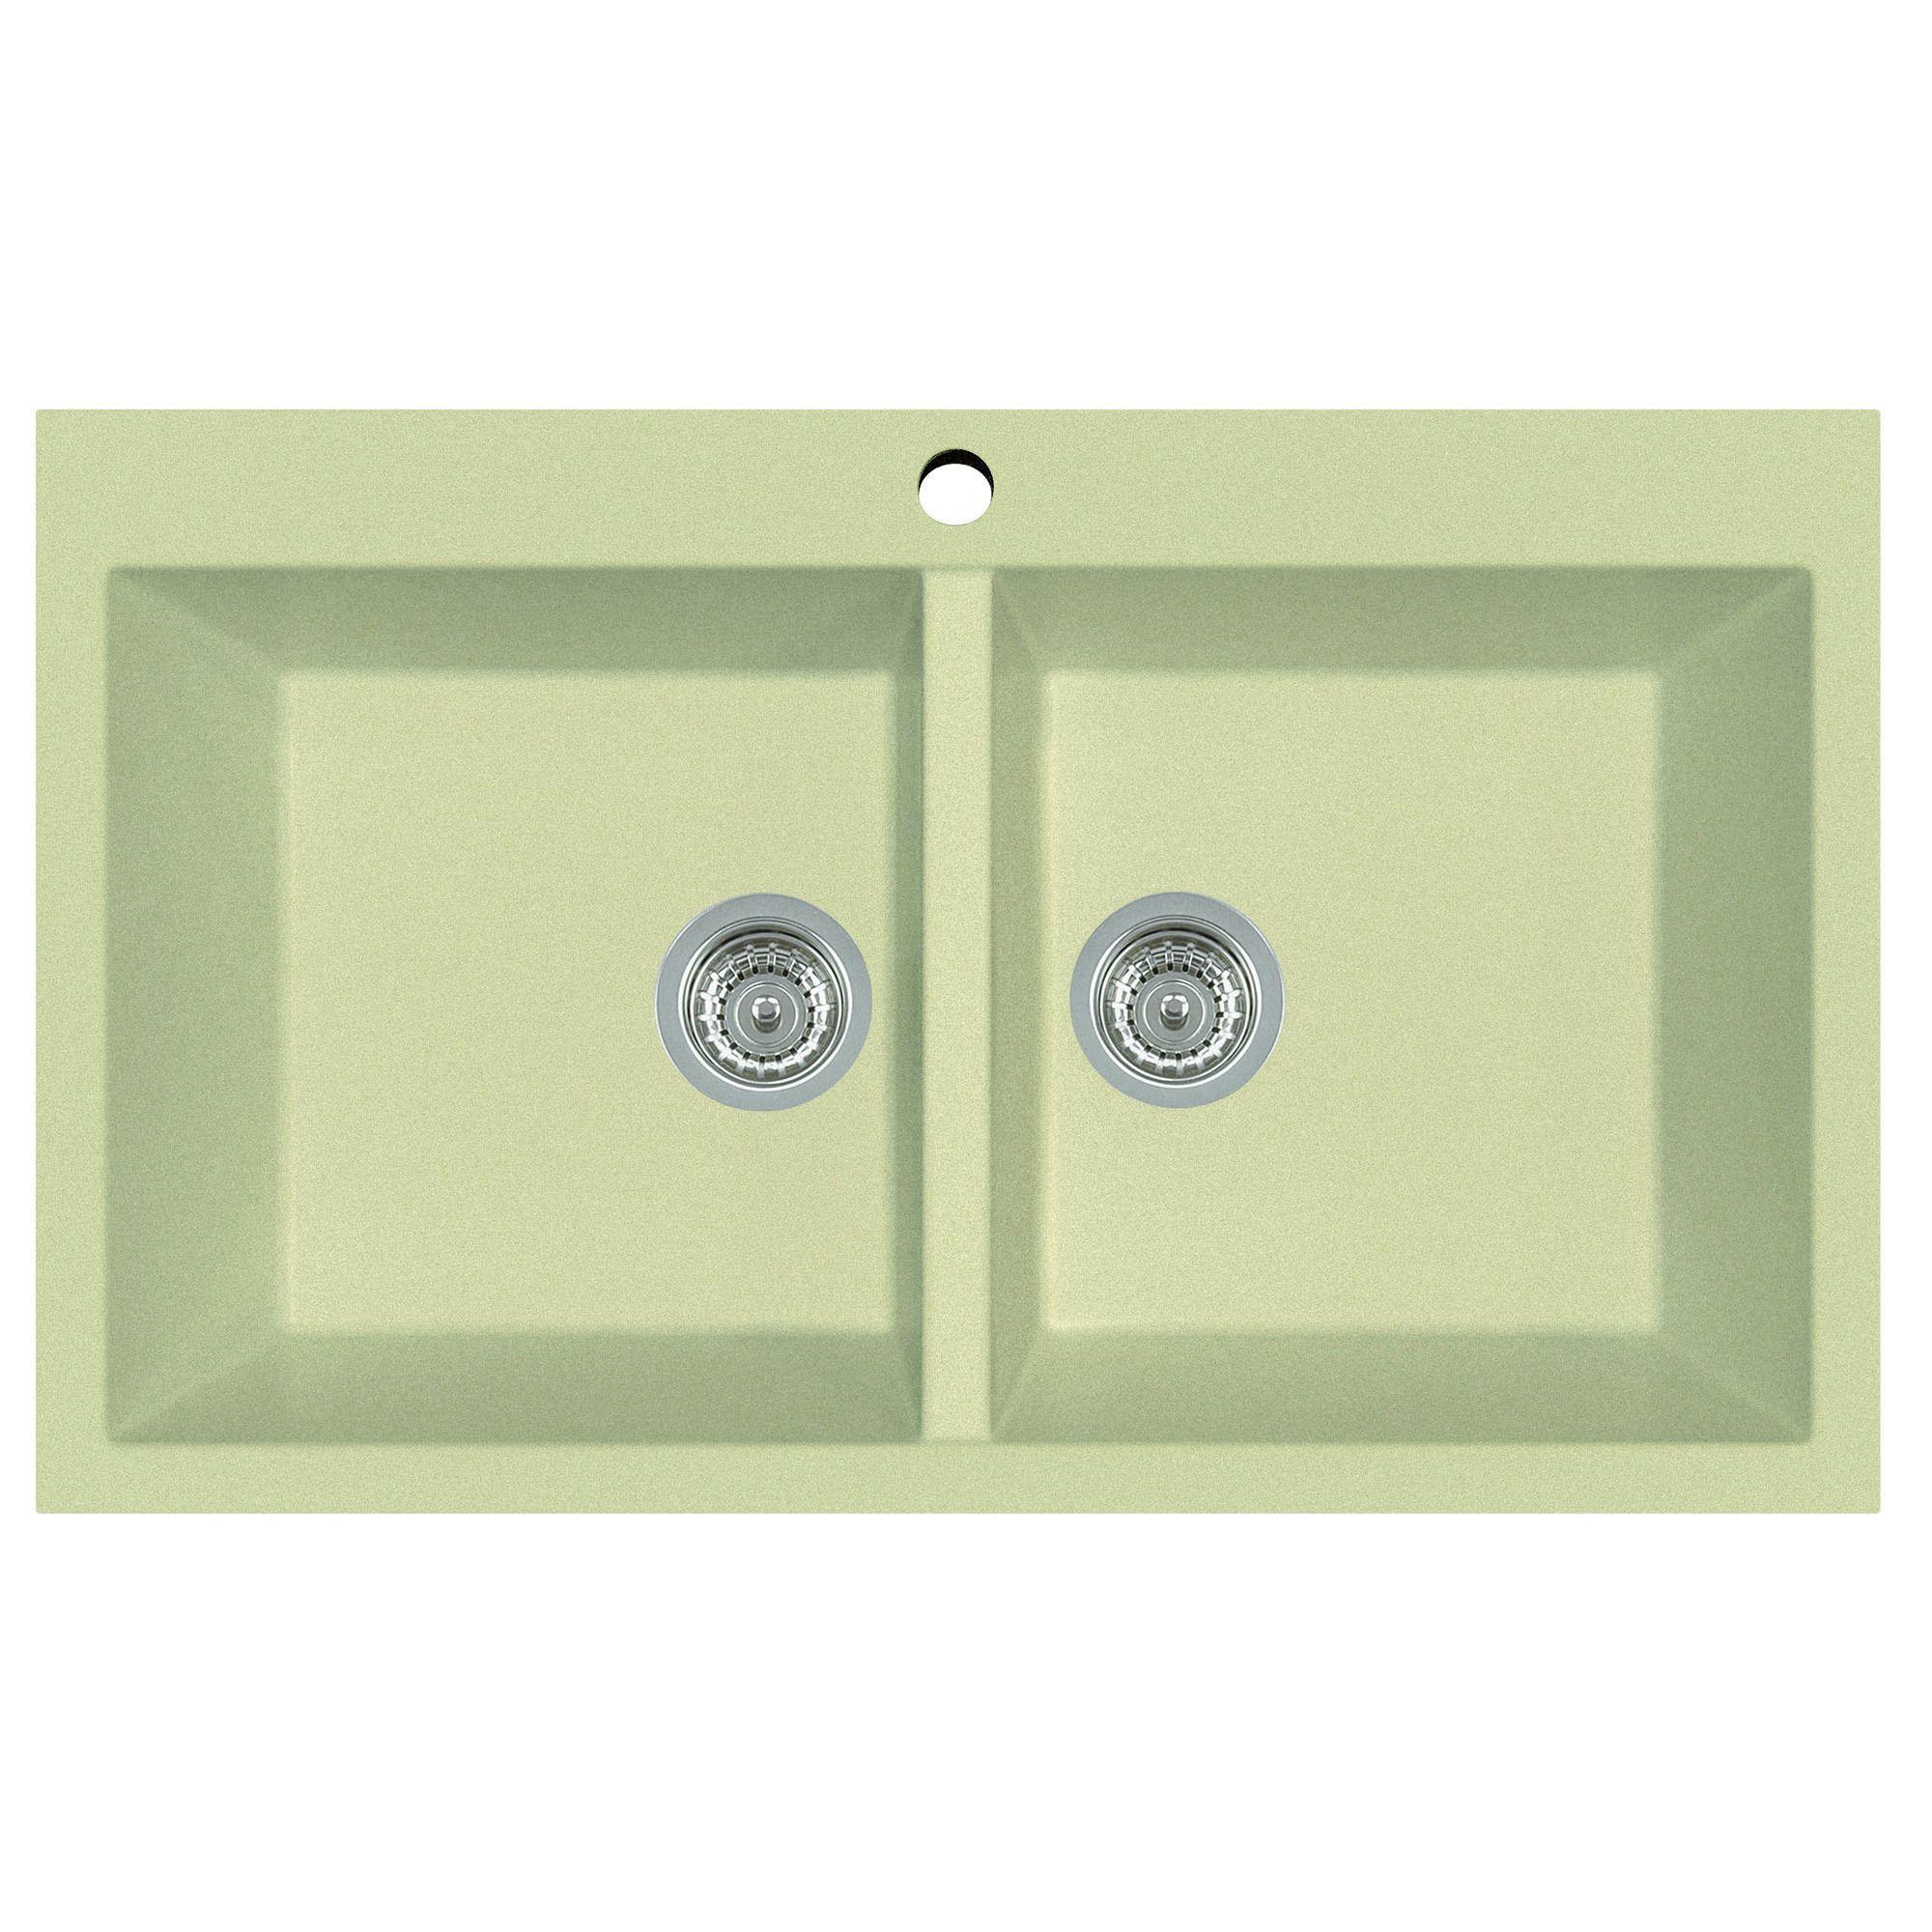 Alfi Biscuit Granite Composite 34 Inch Drop In Double Bowl Kitchen